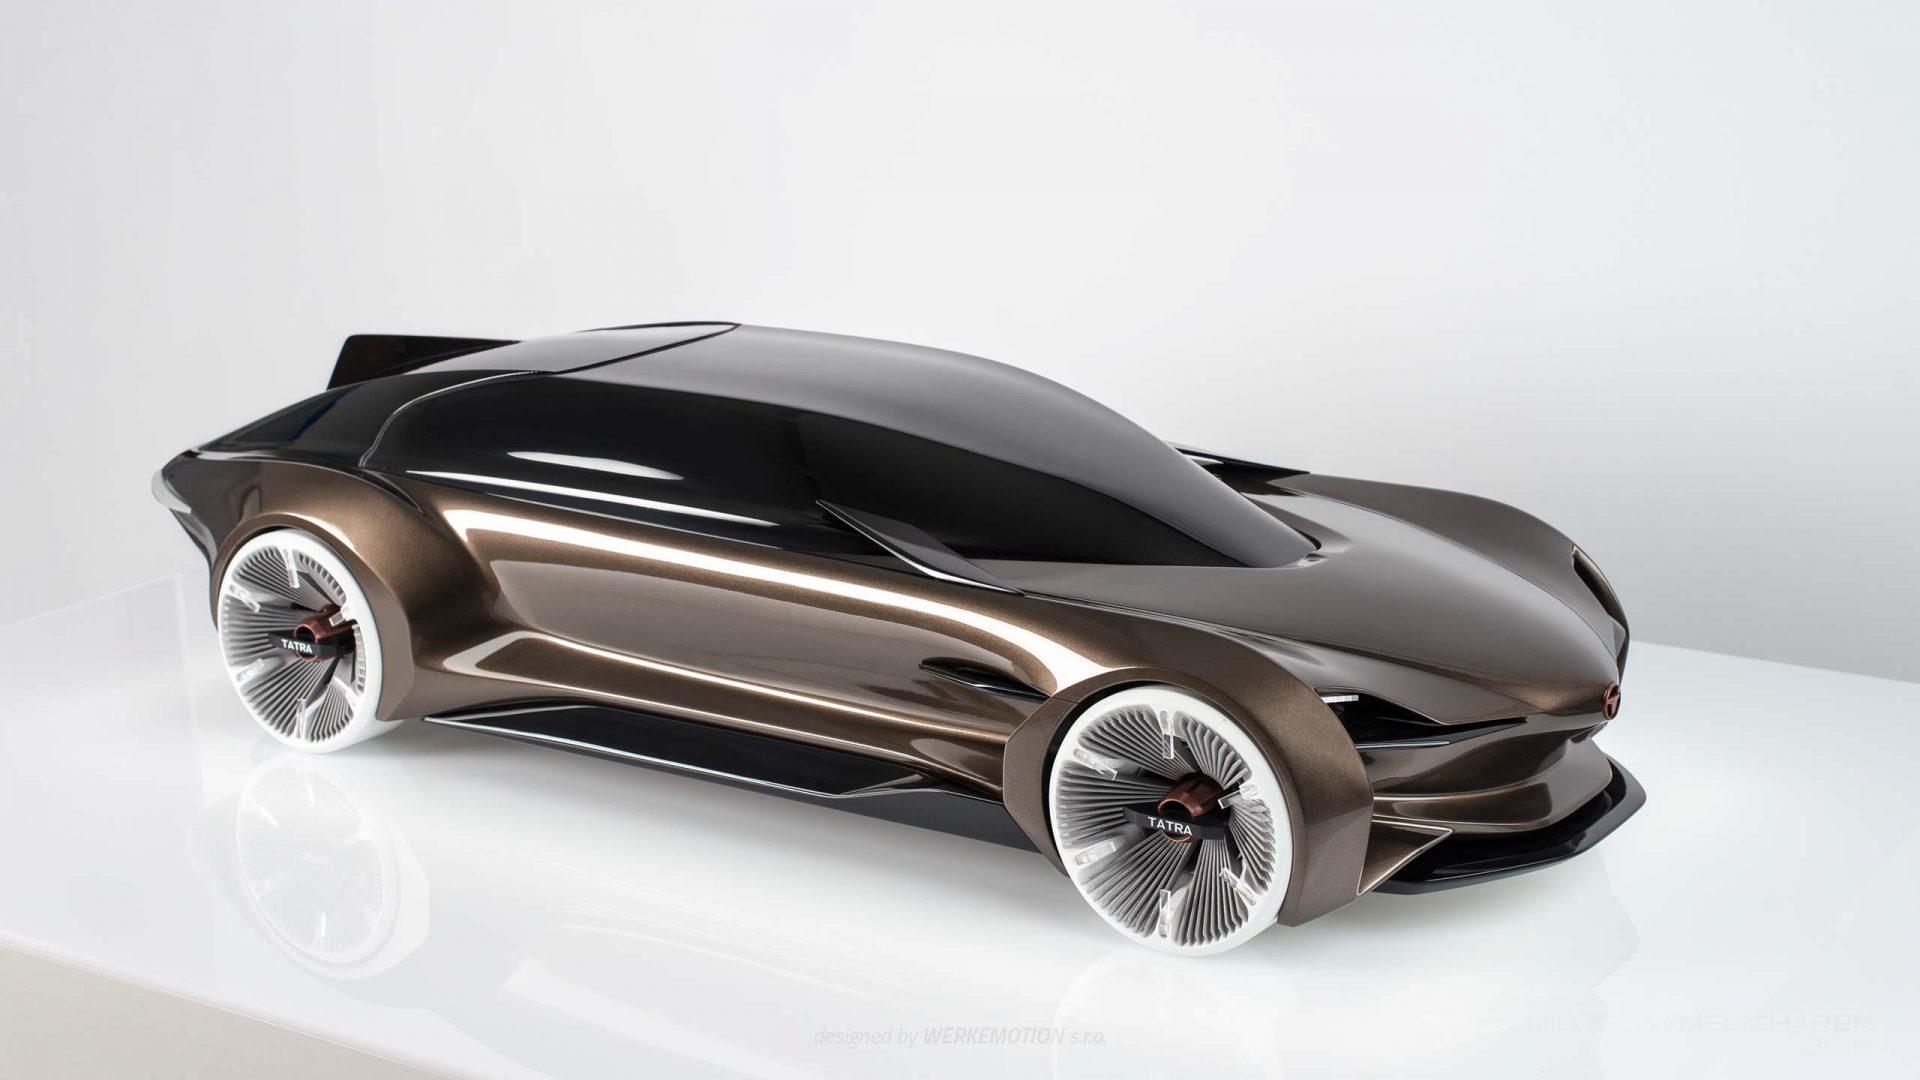 TATRA 7X - Concept by MMelicharek